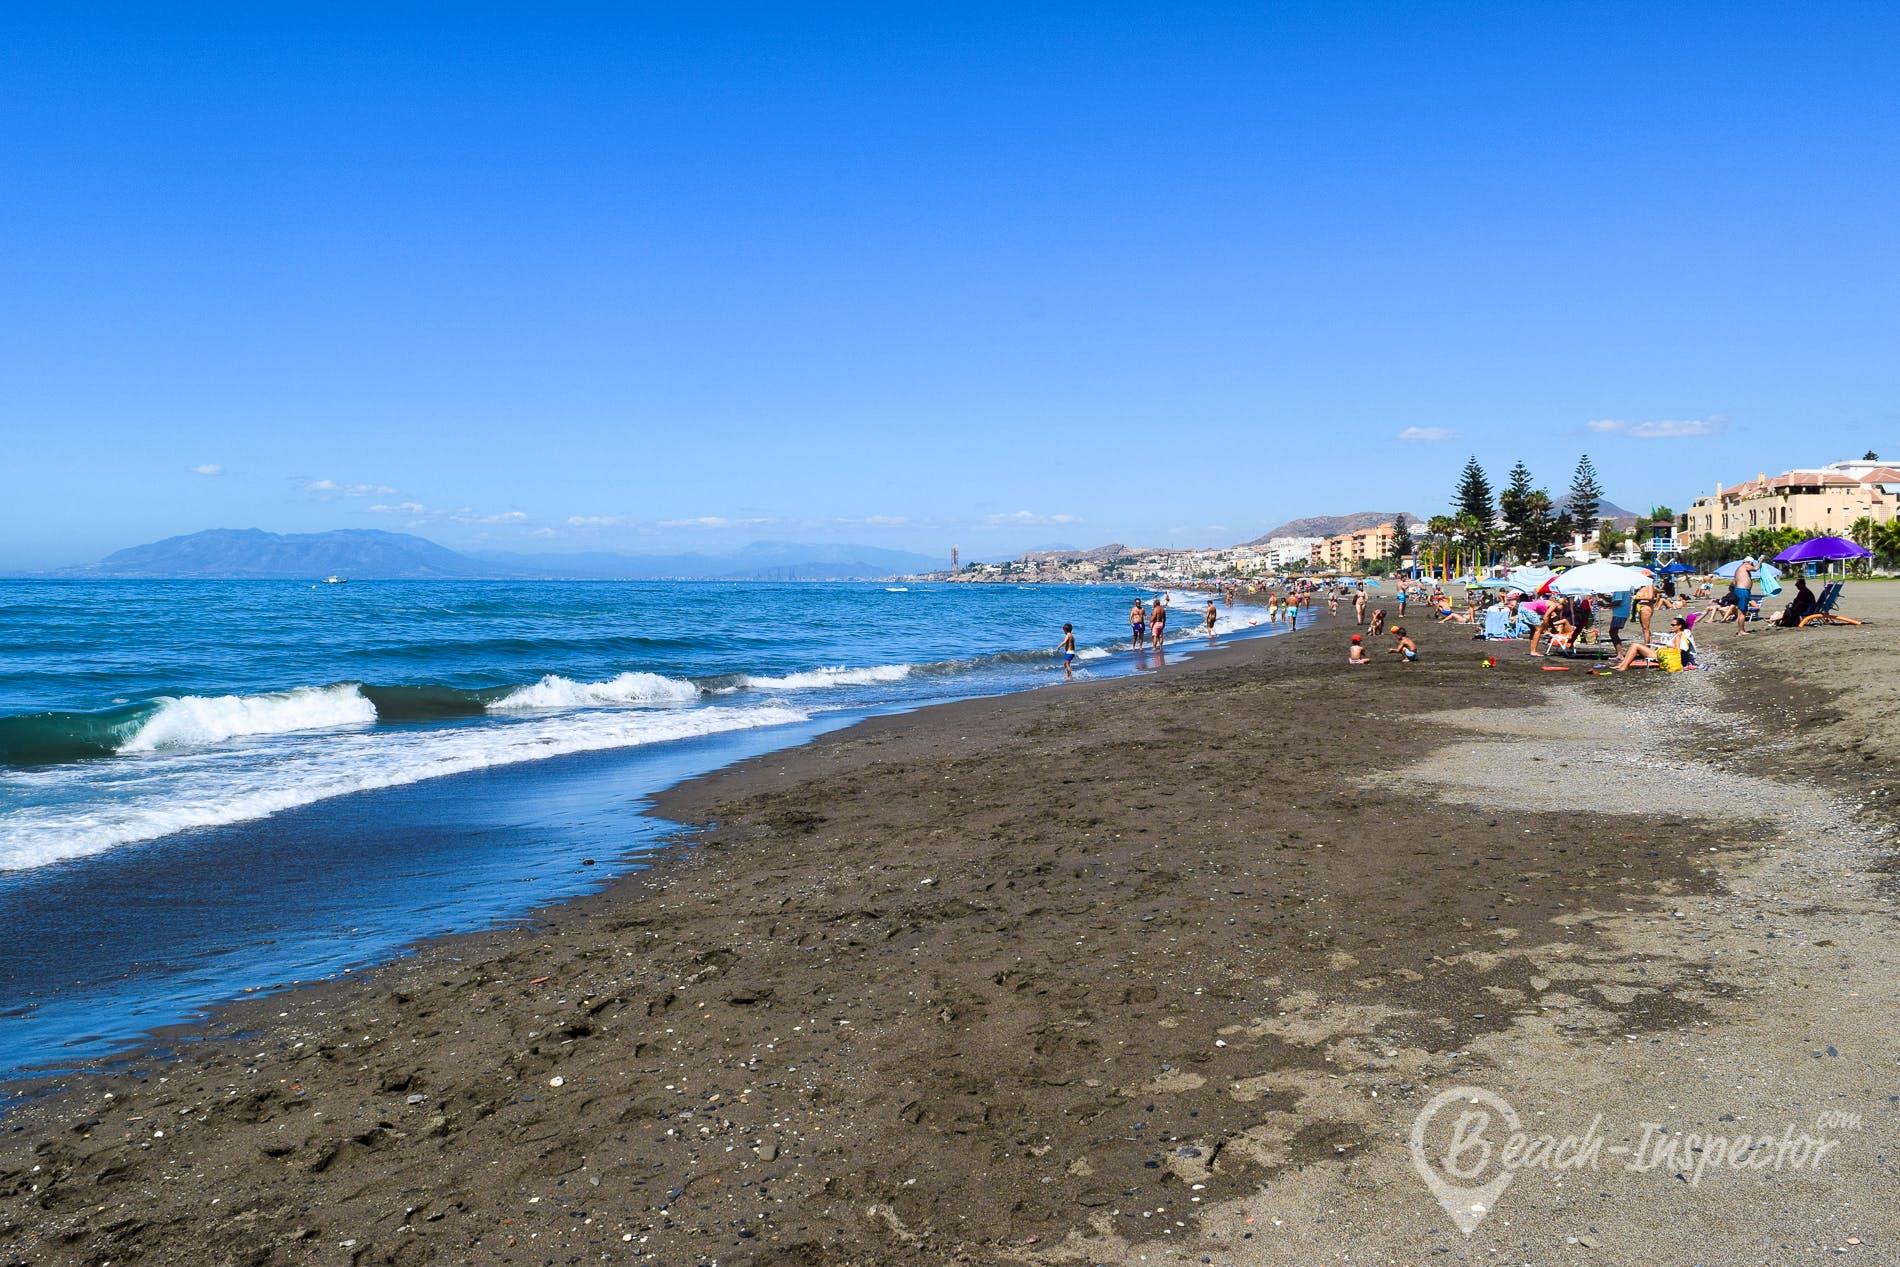 Beach Playa Torre de Benagalbón, Costa del Sol, Spain